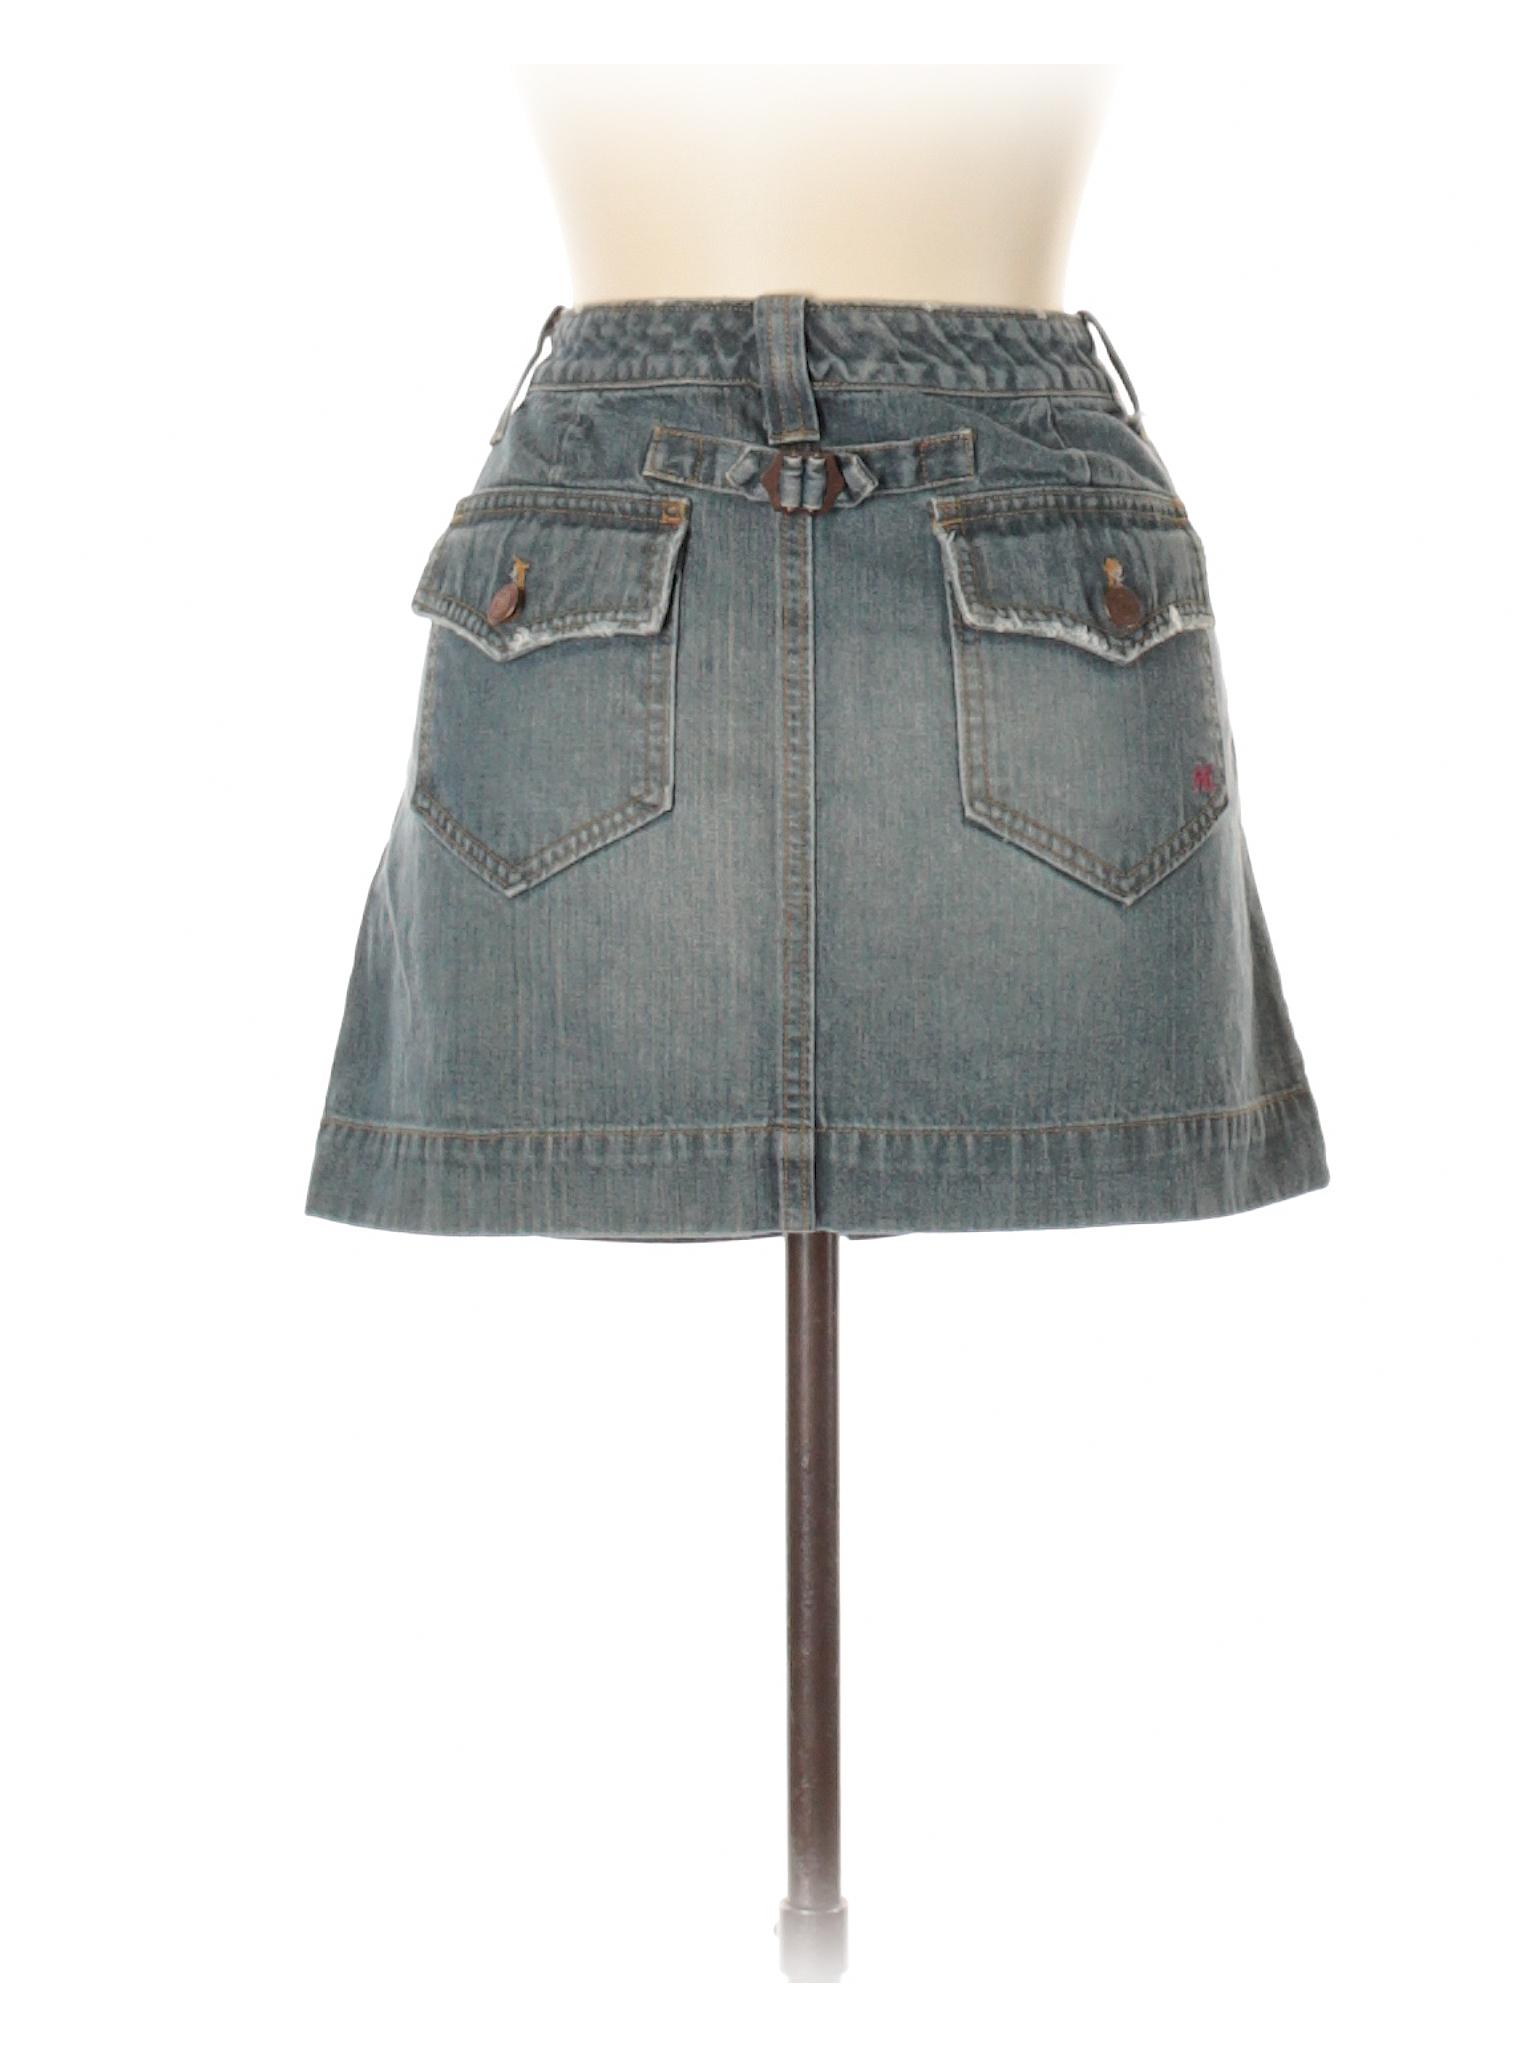 Skirt Denim Skirt Boutique Boutique Boutique Skirt Boutique Denim Denim vwq86